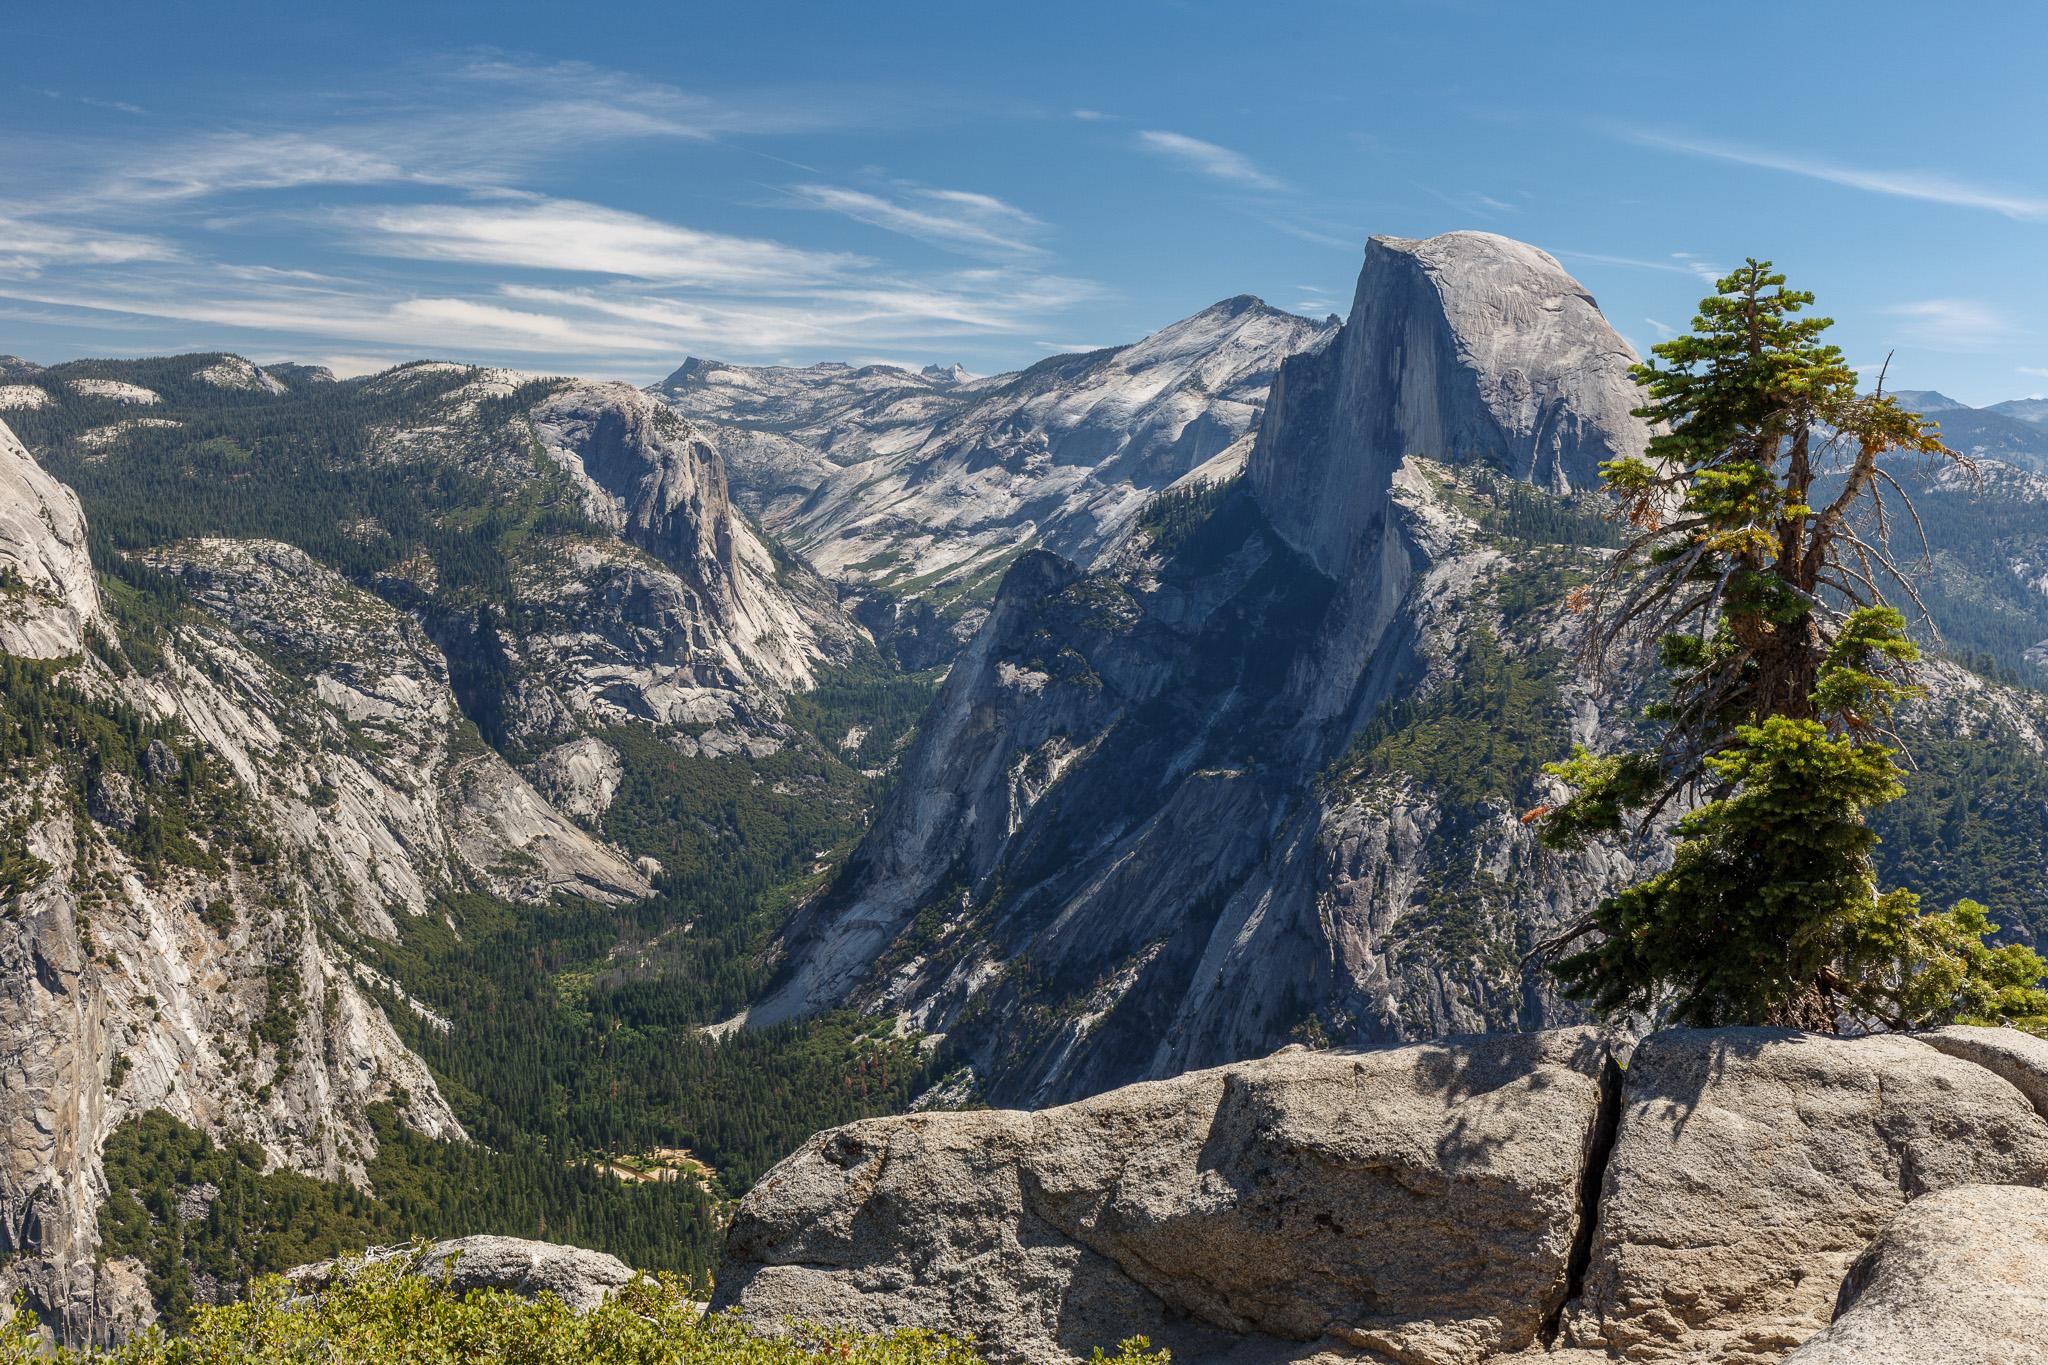 Glacier Point - Yosemite National Park, USA